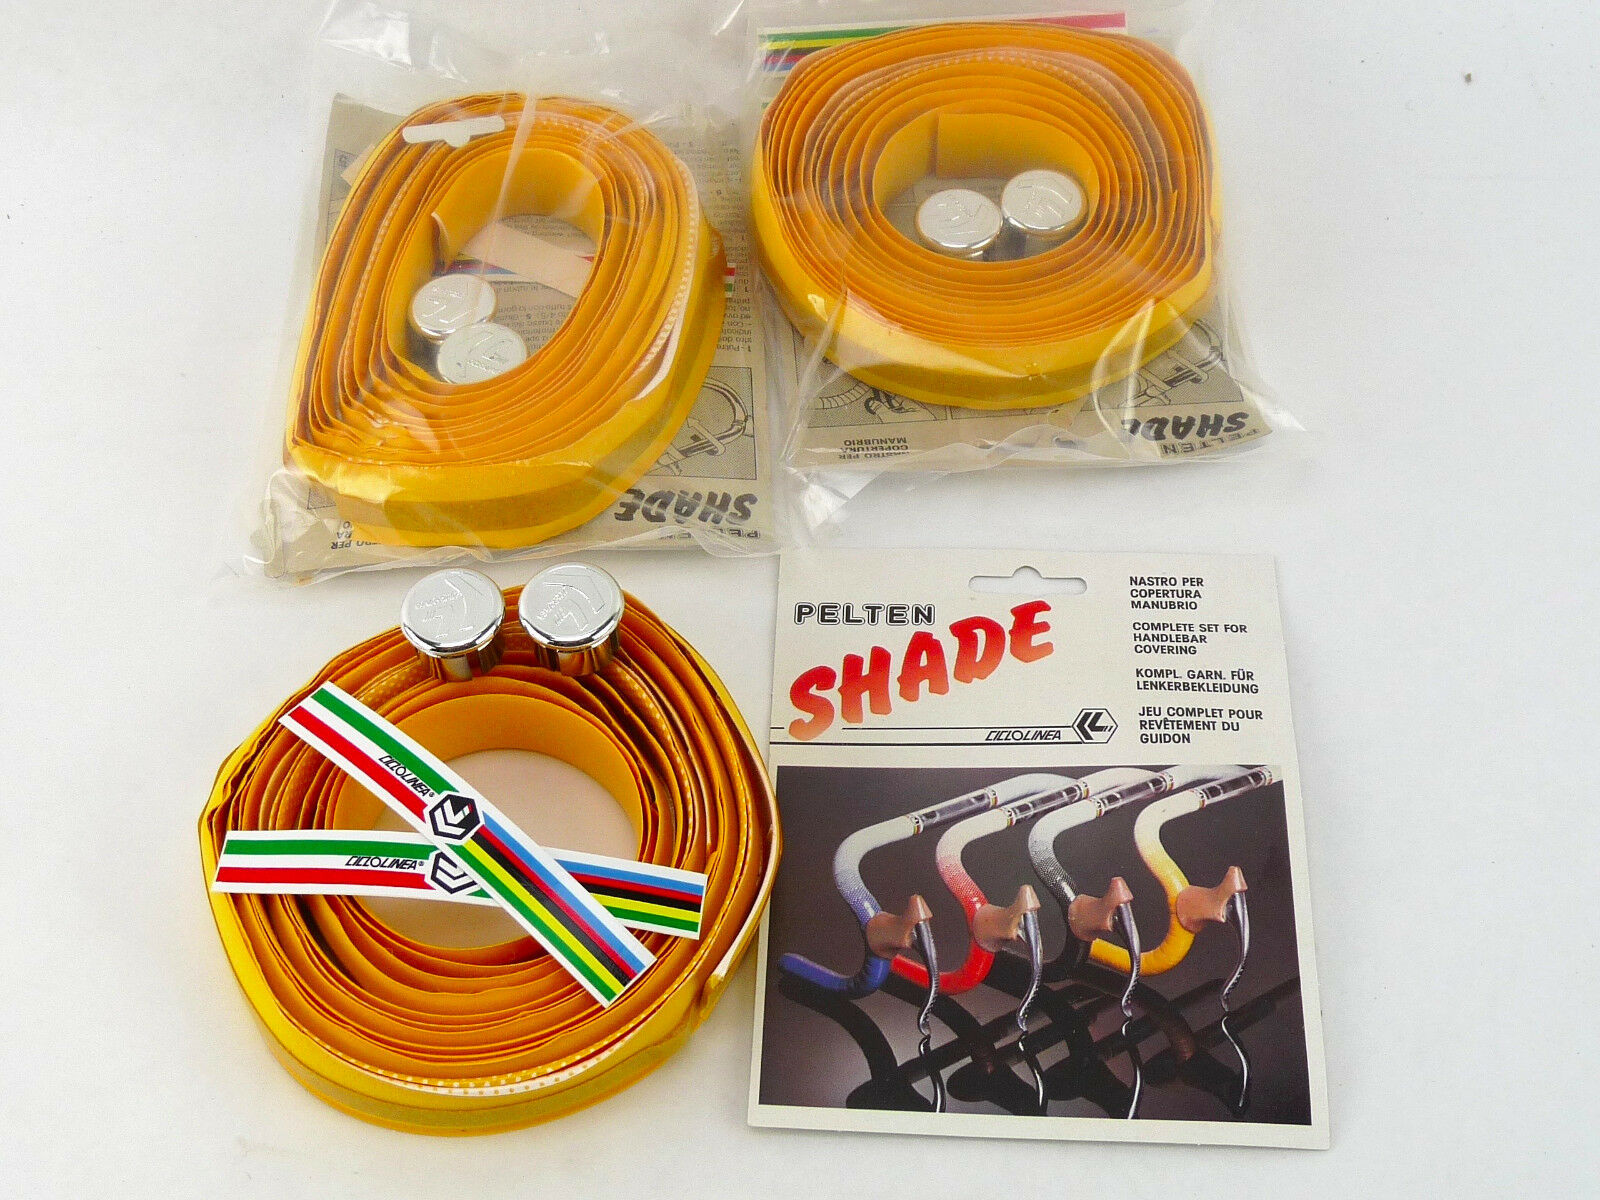 Vintage Handlebar tape Yellow Pelten Shade graduating 1980-90's Bike NOS x 3 LOT